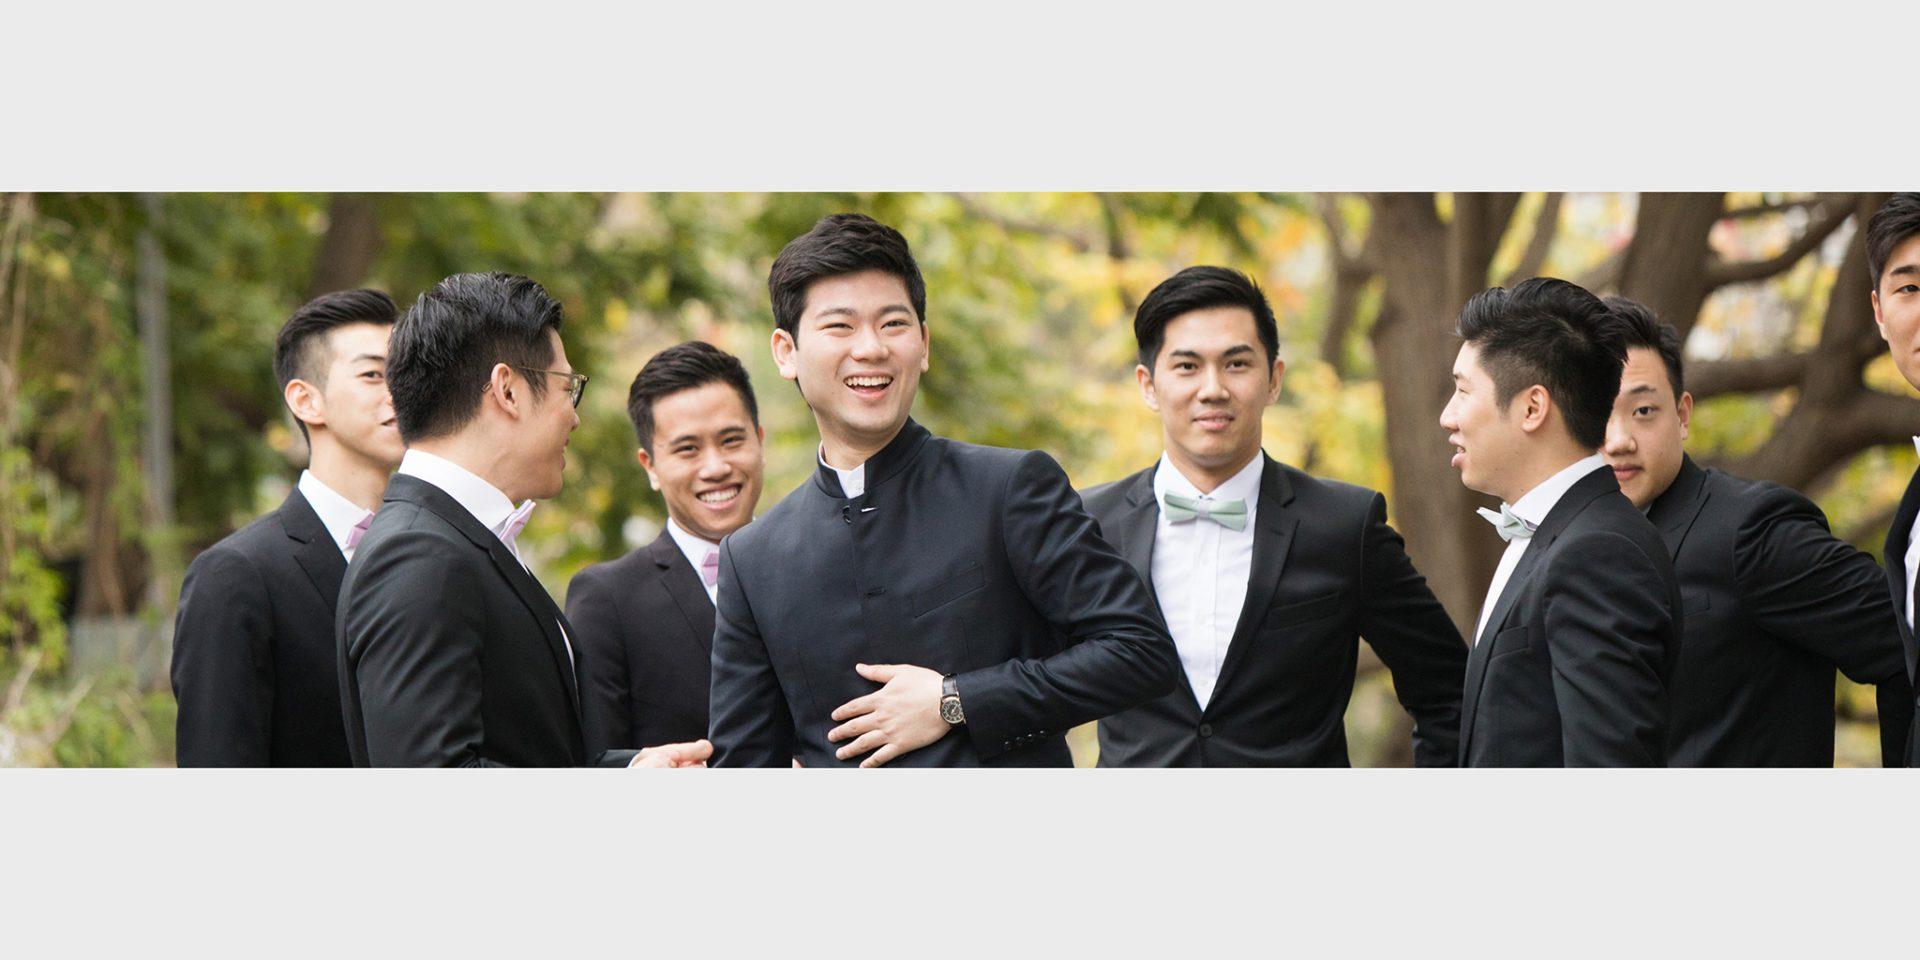 wedding_hk_11